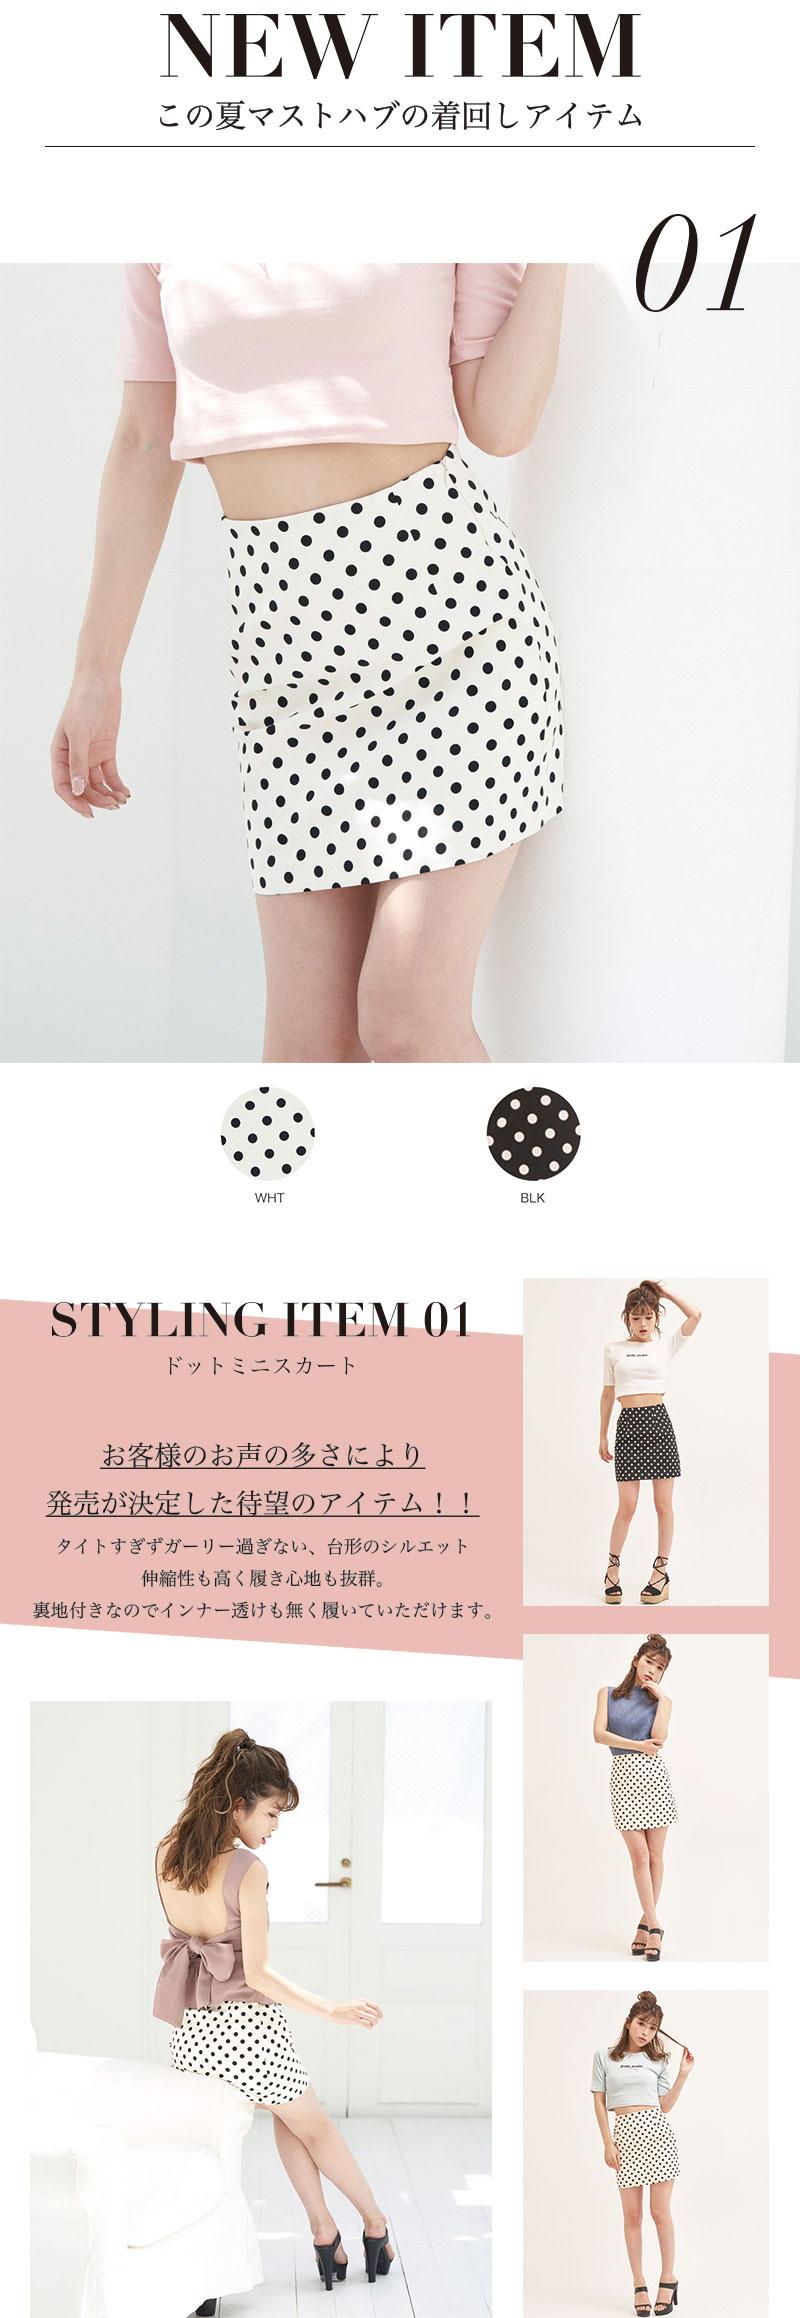 18SS Joli,JolieタイトTシャツ&新作特集3